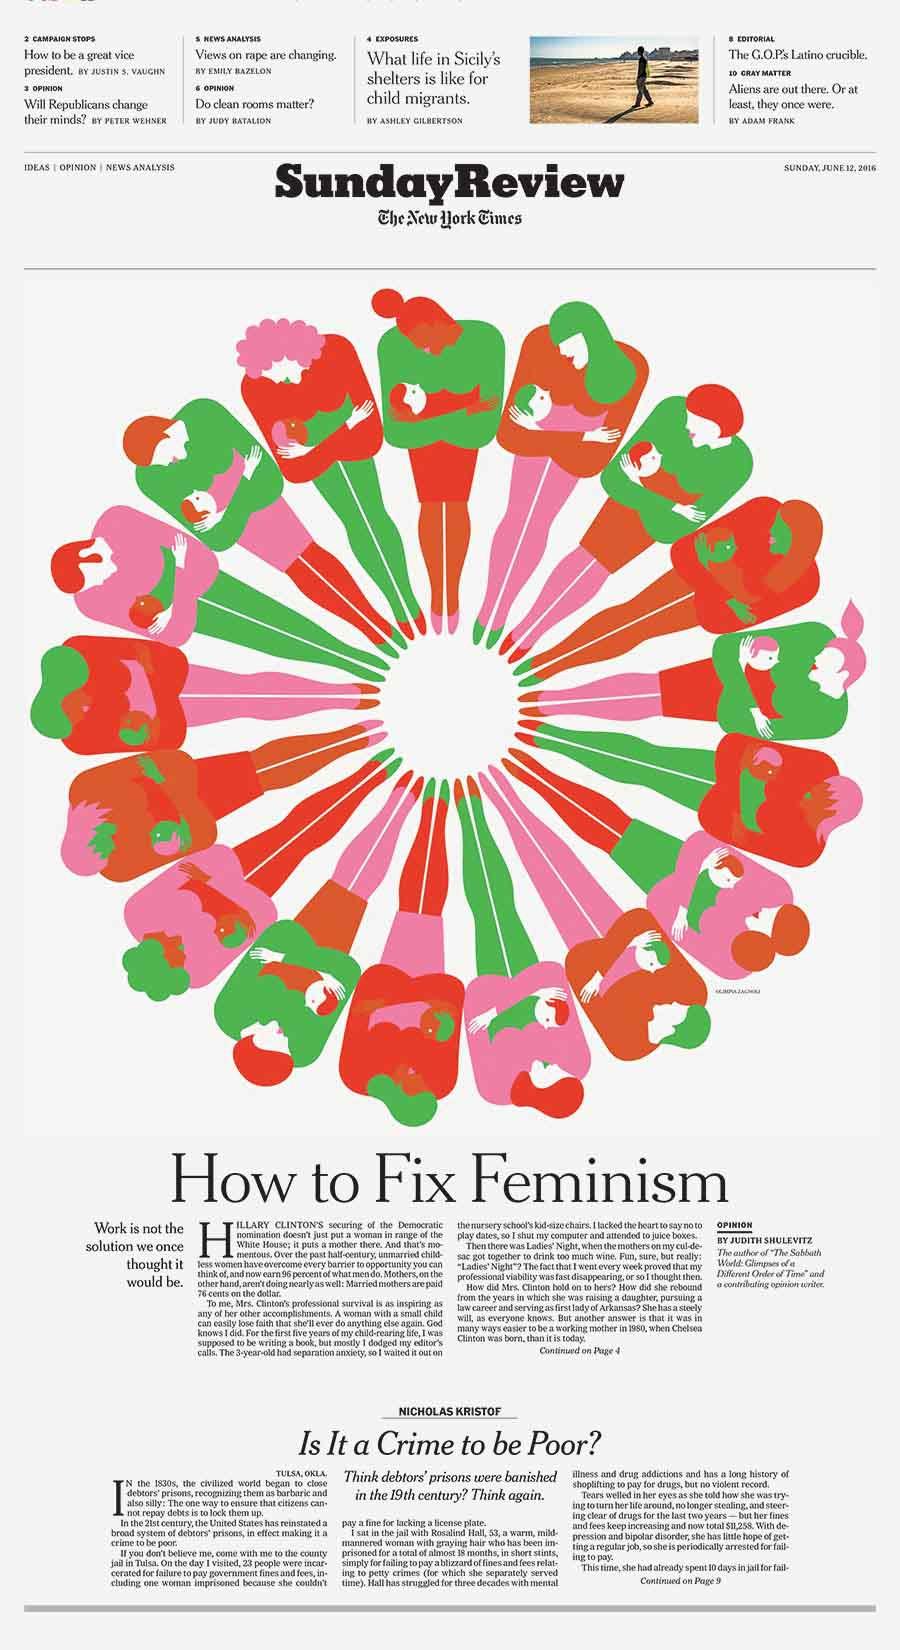 How to Fix Feminism